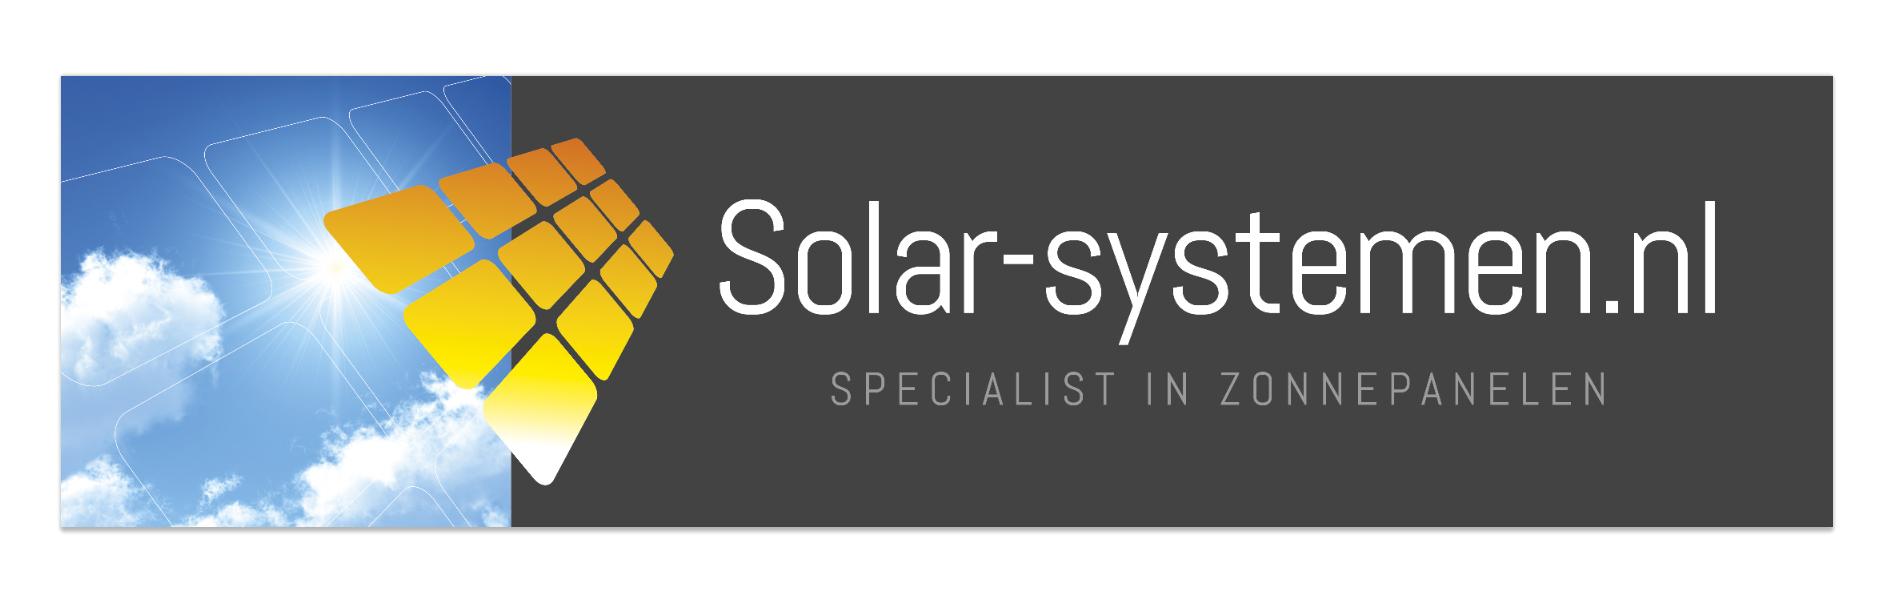 Solar-Systemen.nl s-Hertogenbosch